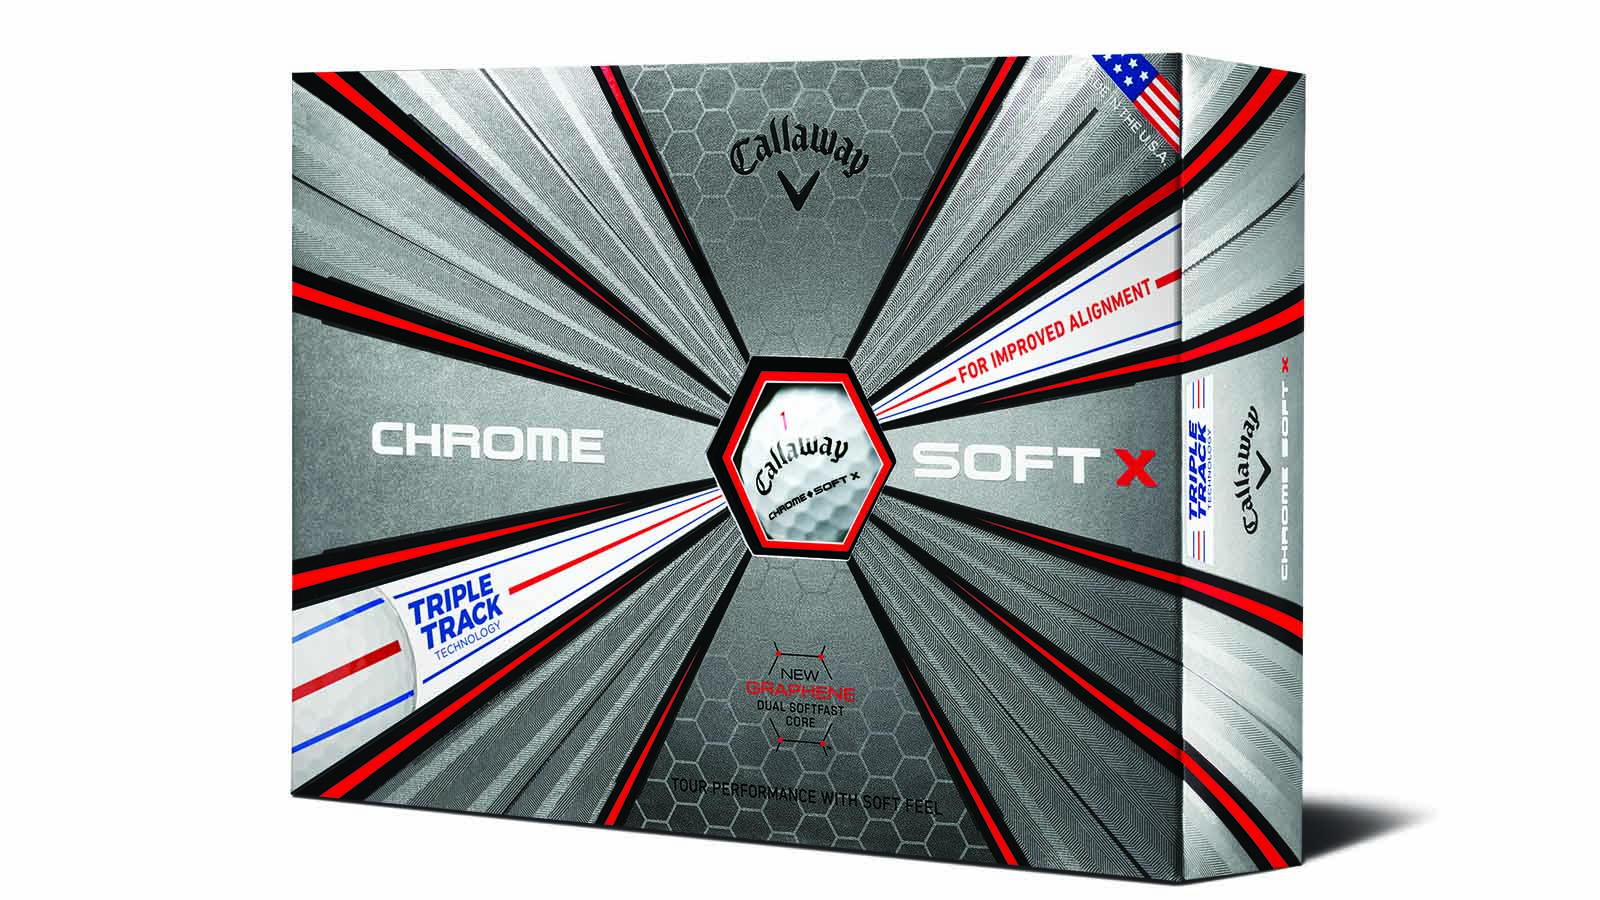 chrome-soft-x-triple-track-12-ball-box-2019.jpg